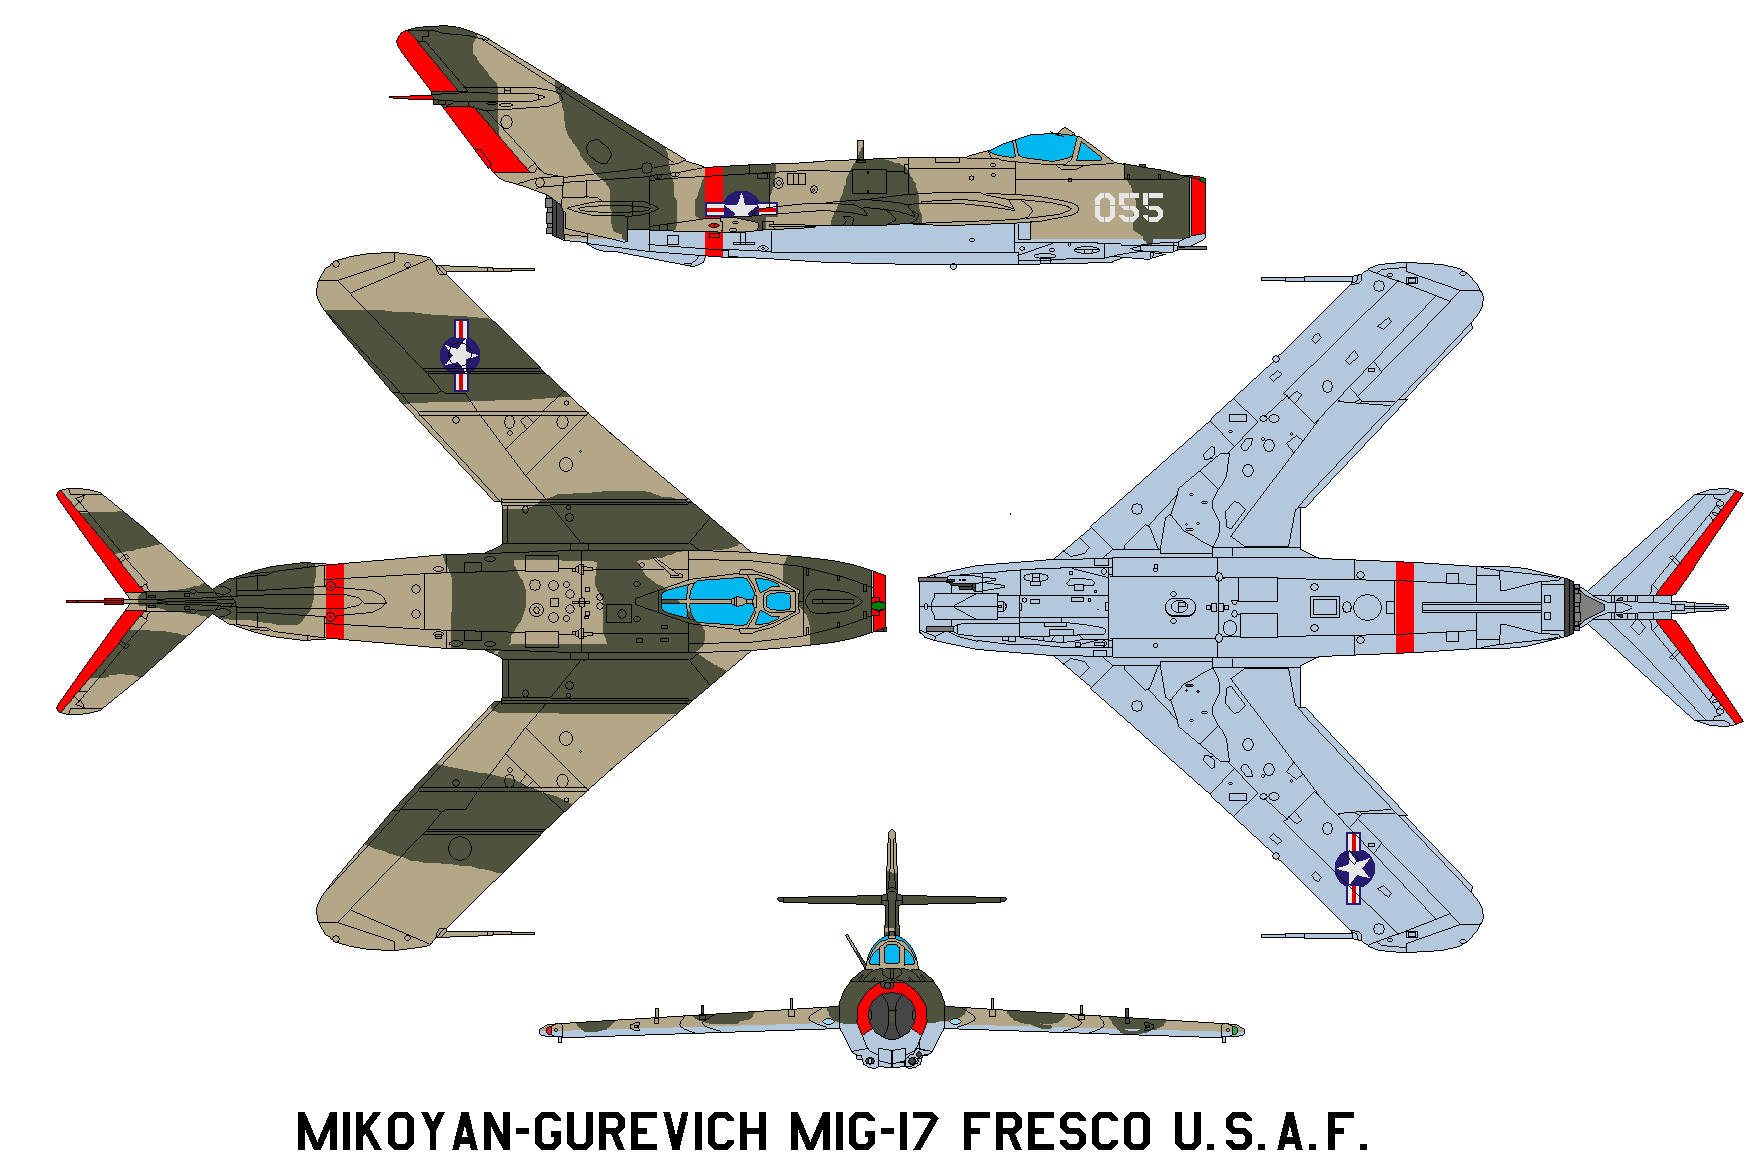 Mikoyan-Gurevich MiG-17 Fresco U.S.A.F. by bagera3005